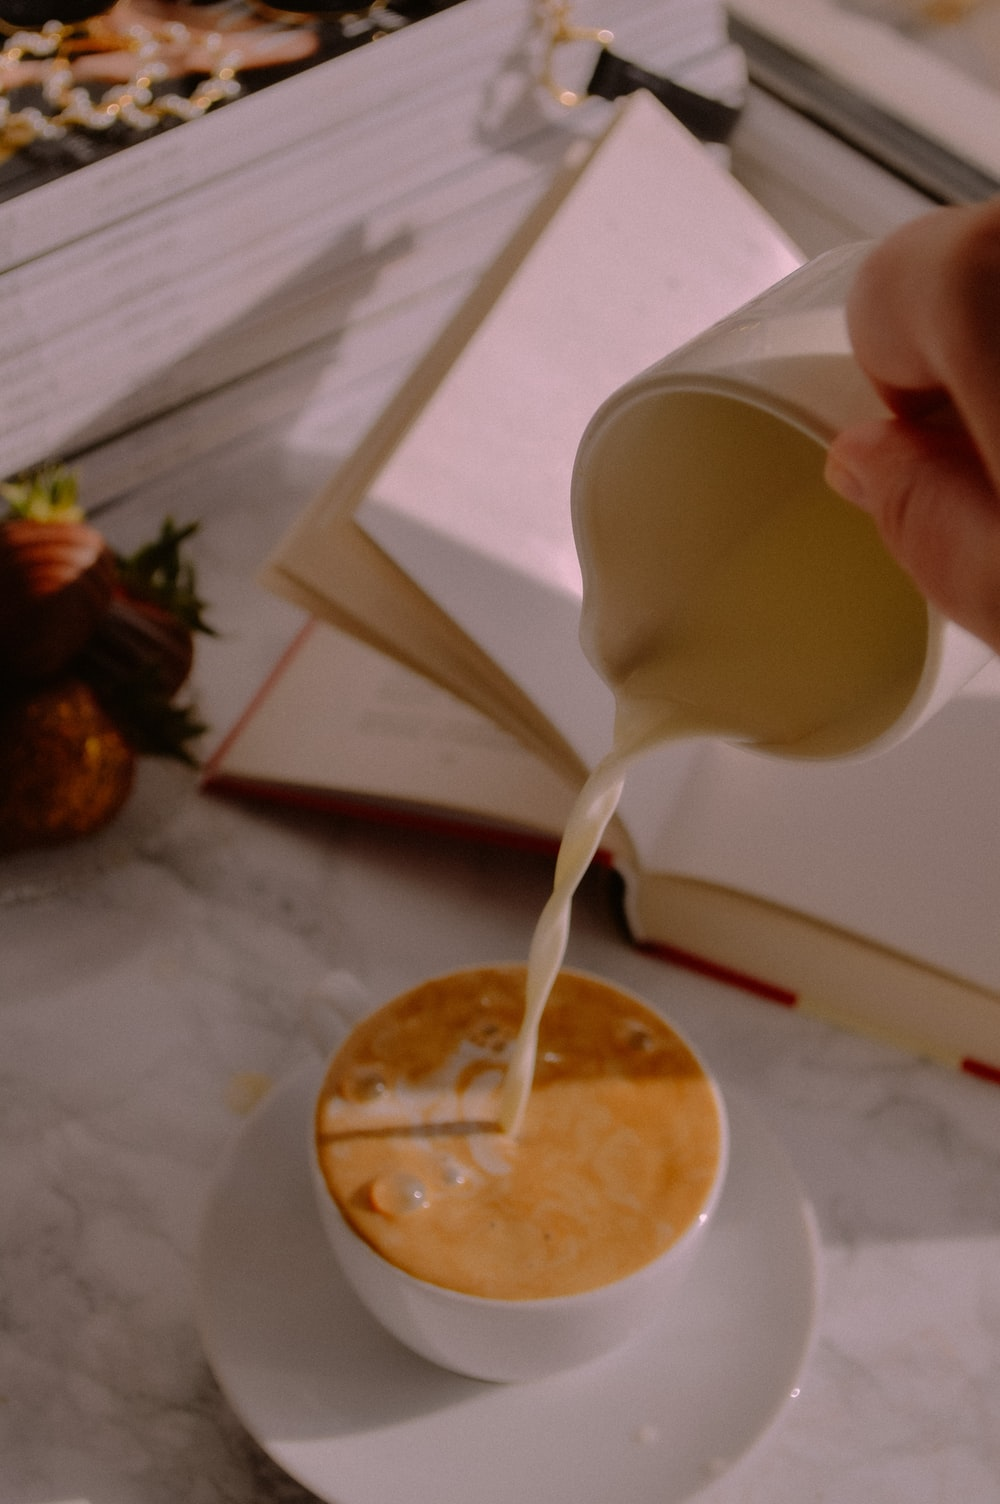 white plastic spoon on white ceramic plate